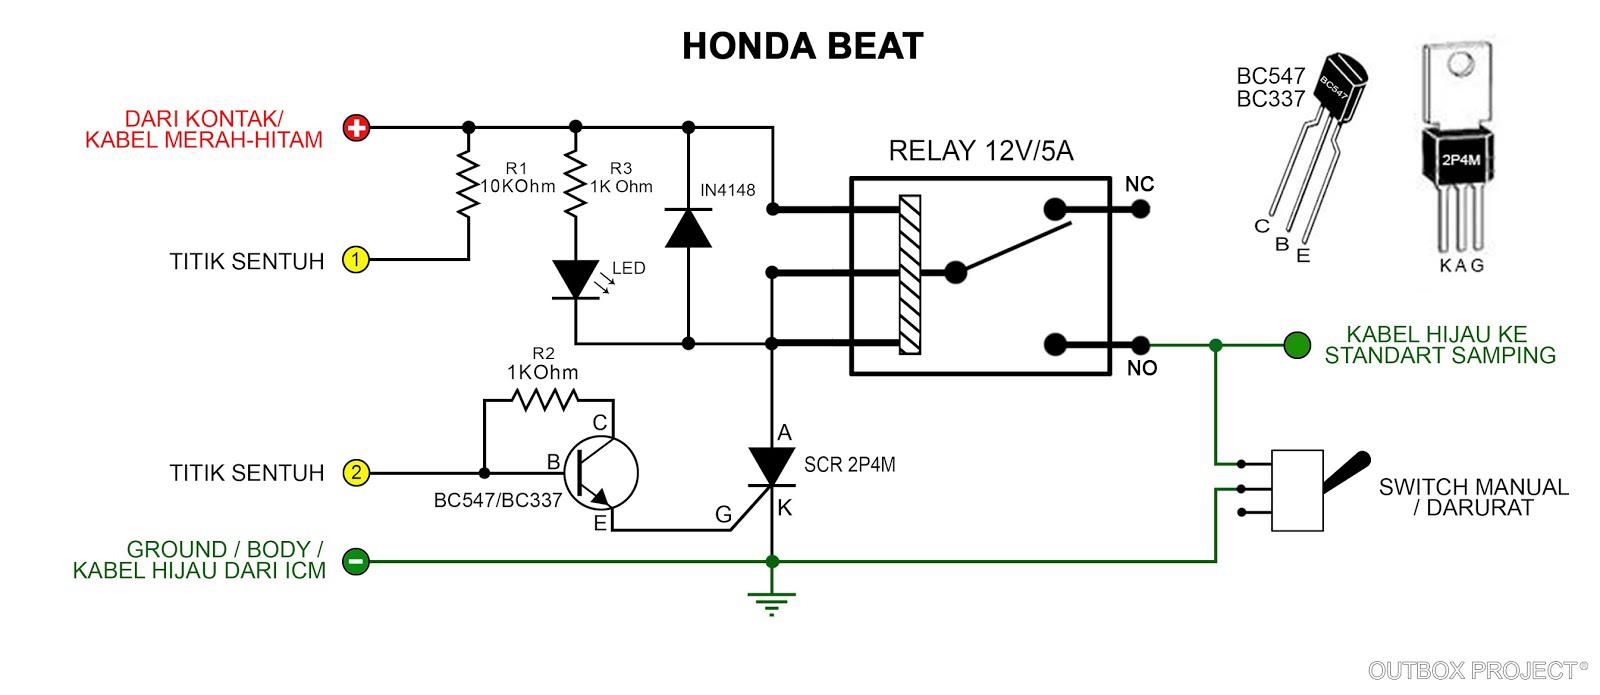 - OutBox Project: Membuat Pengaman Motor Sederhana dengan